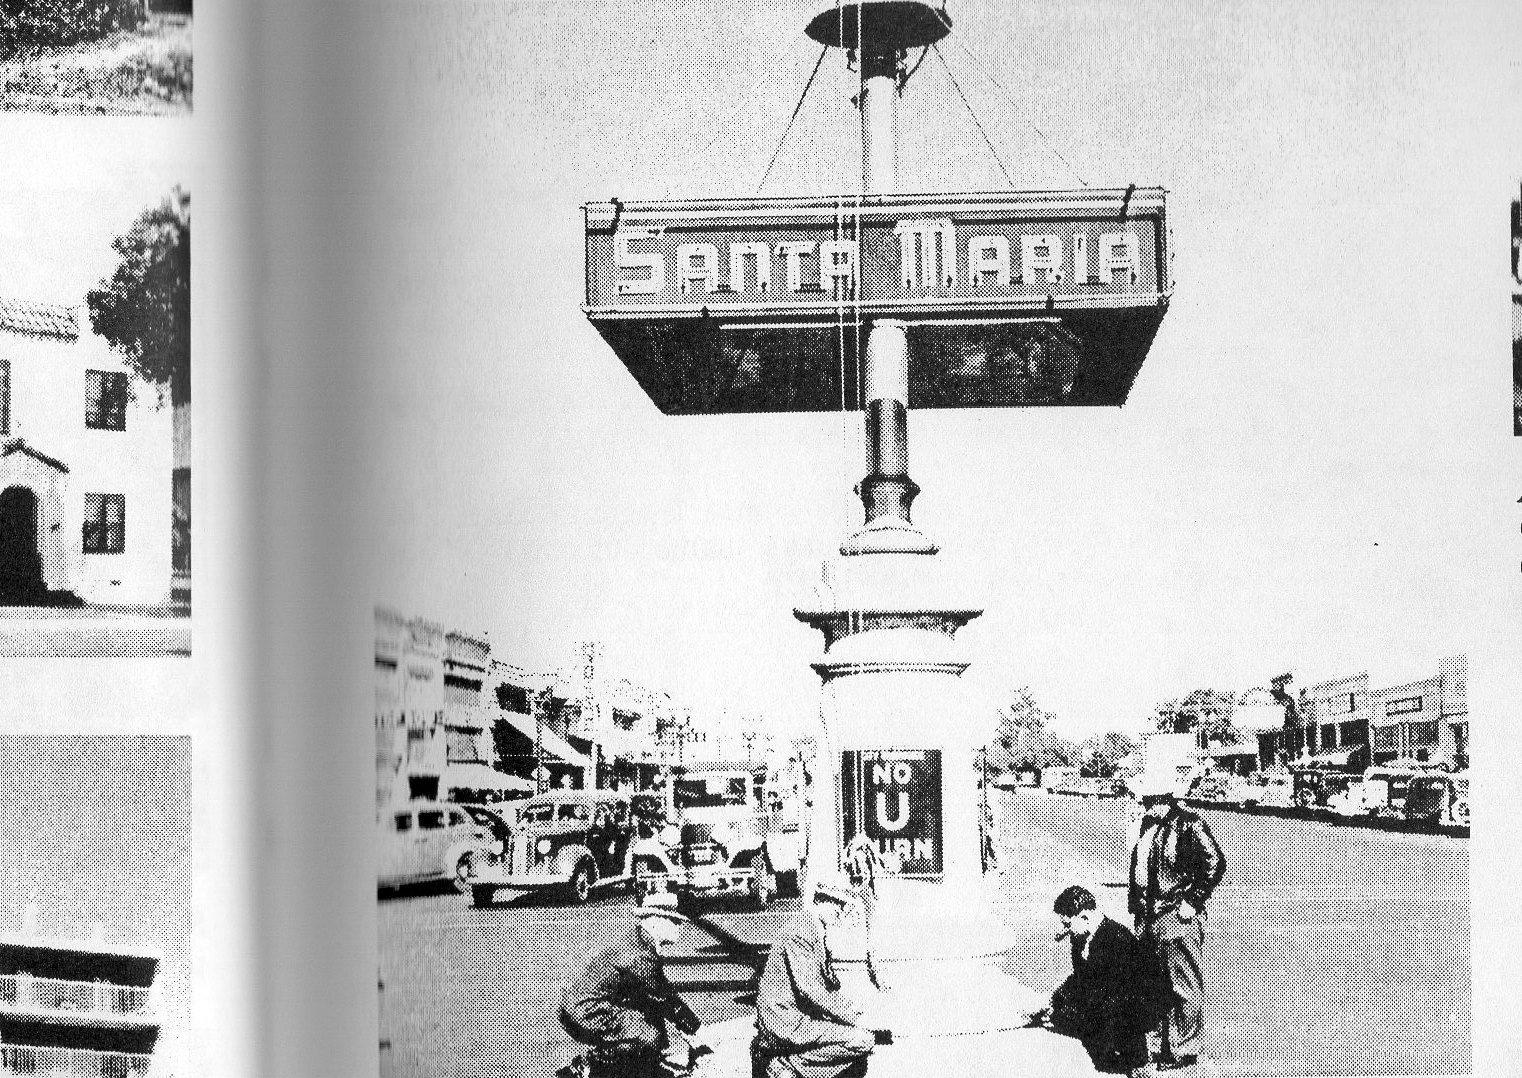 Santa Maria Santa maria california, California history